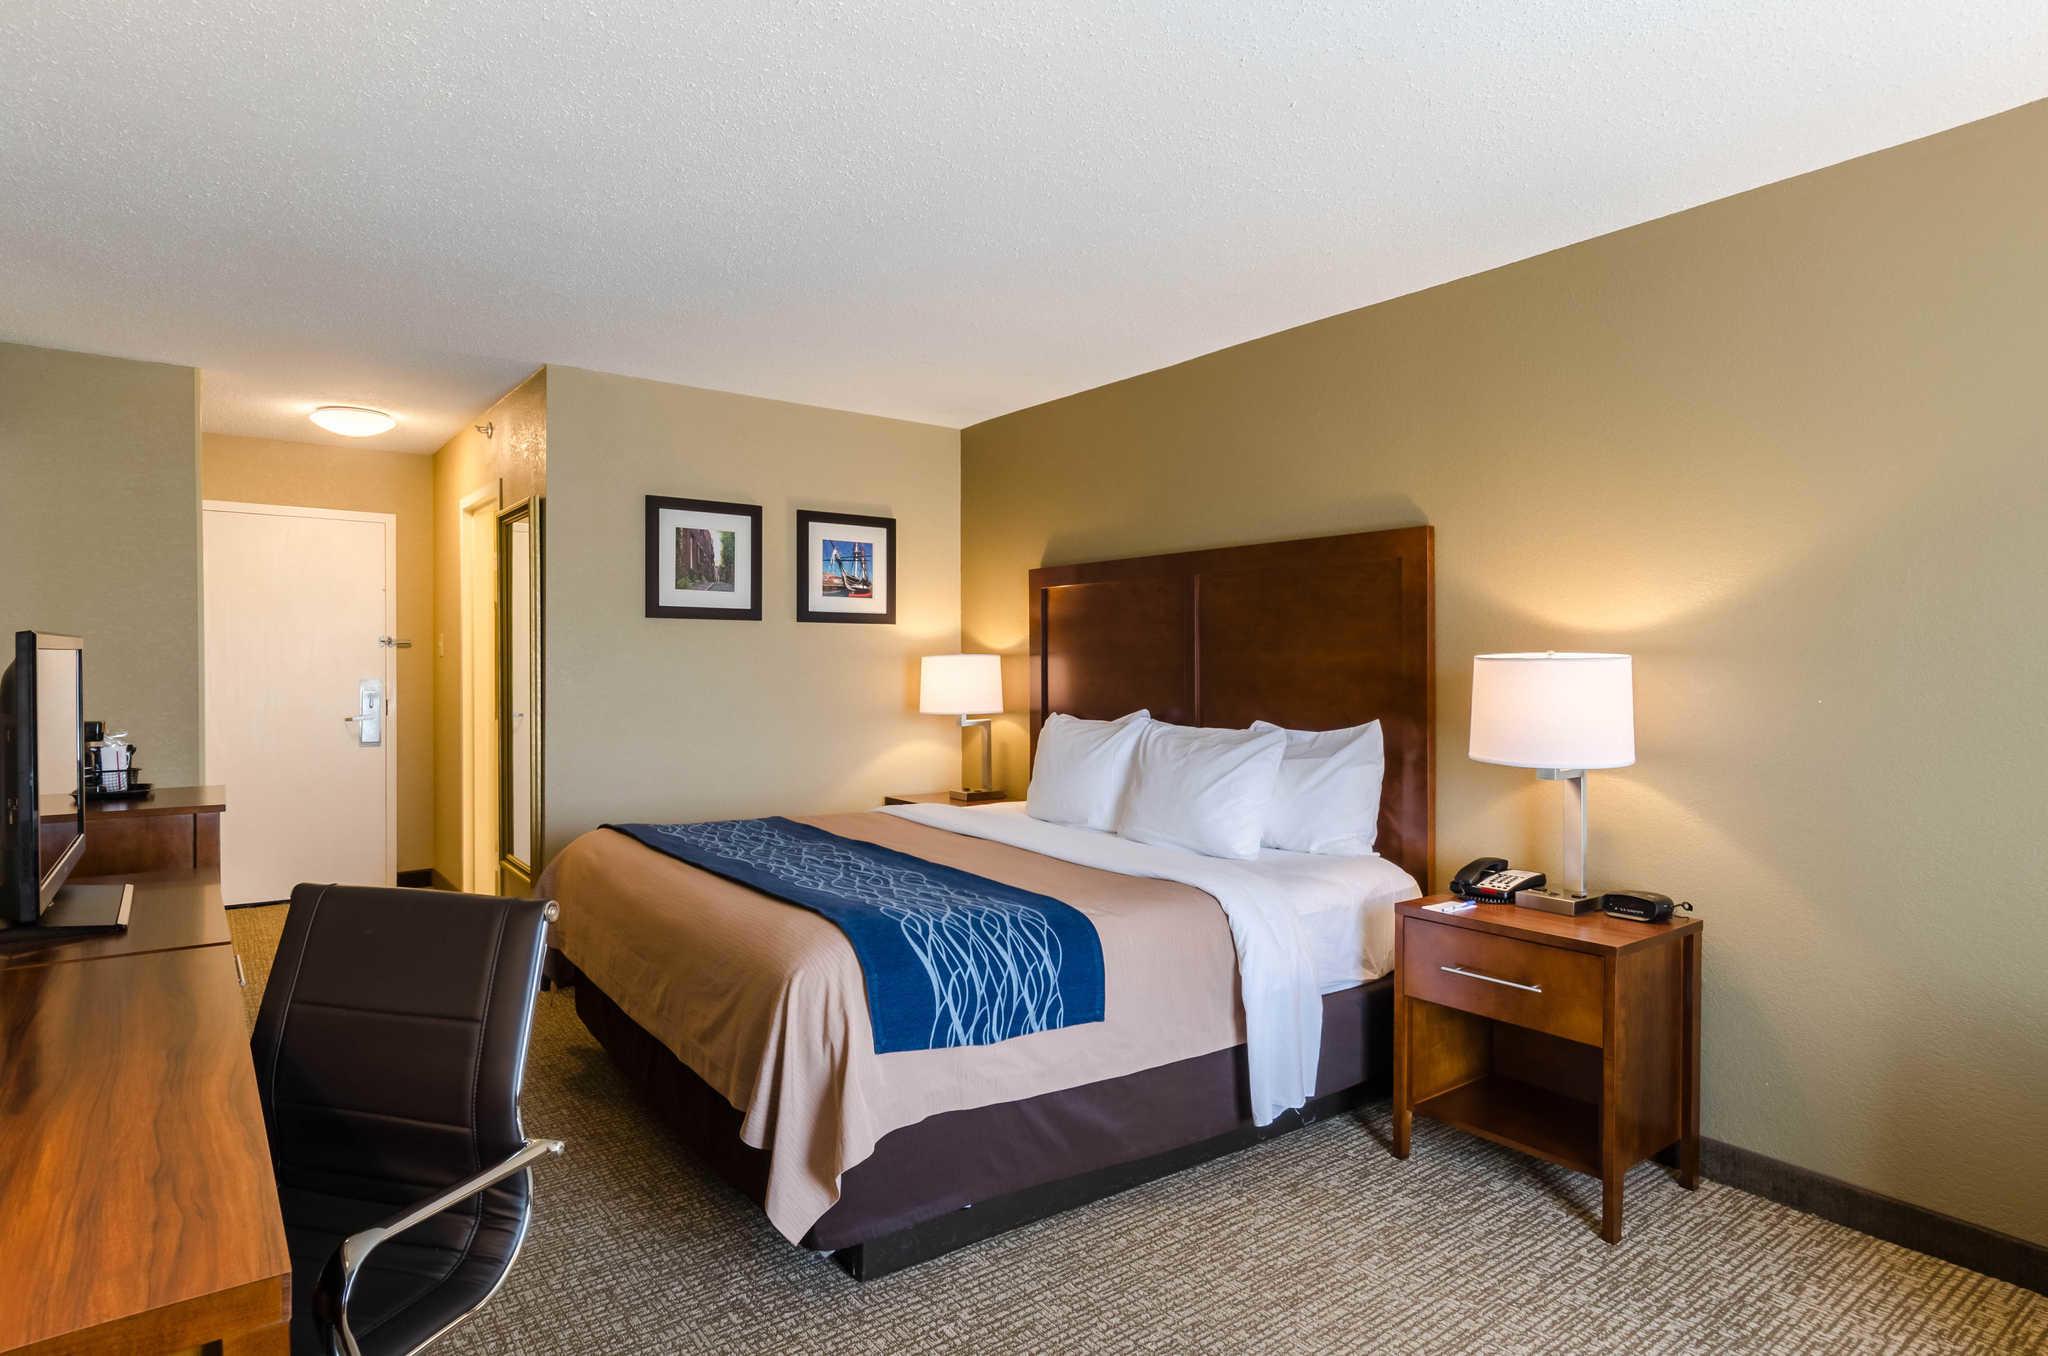 Comfort Inn Randolph - Boston image 47